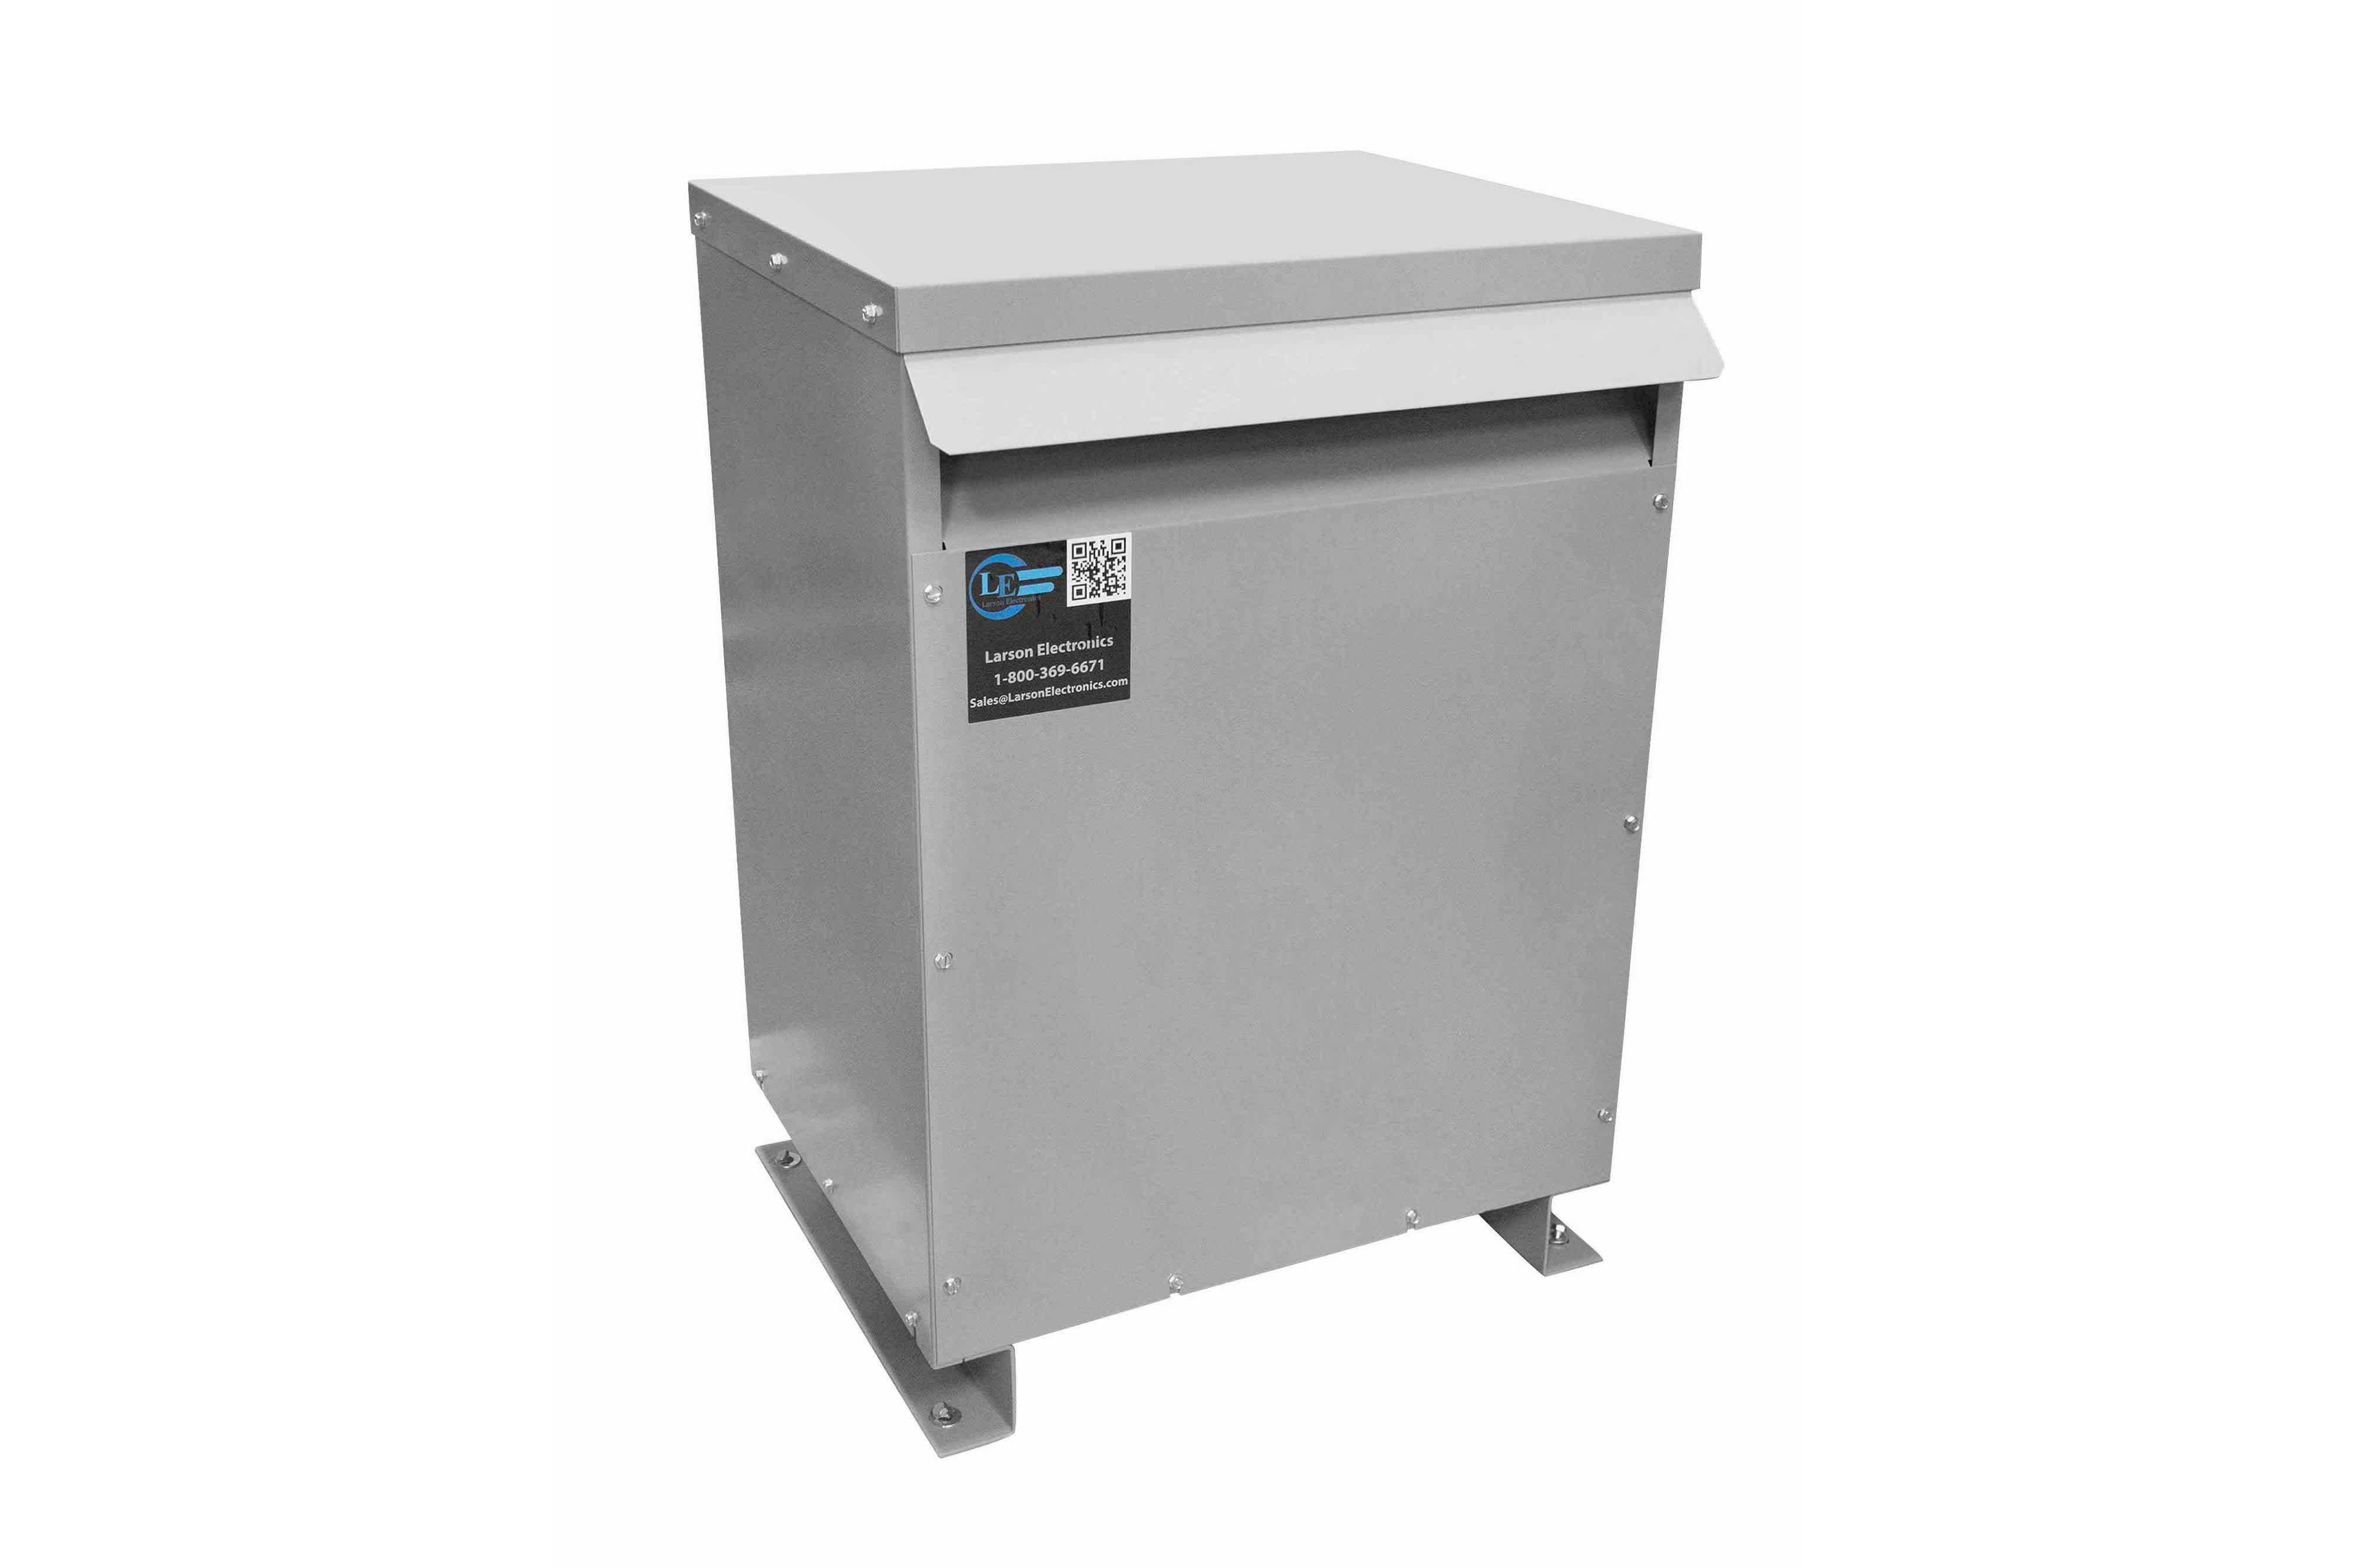 9 kVA 3PH Isolation Transformer, 575V Wye Primary, 208Y/120 Wye-N Secondary, N3R, Ventilated, 60 Hz